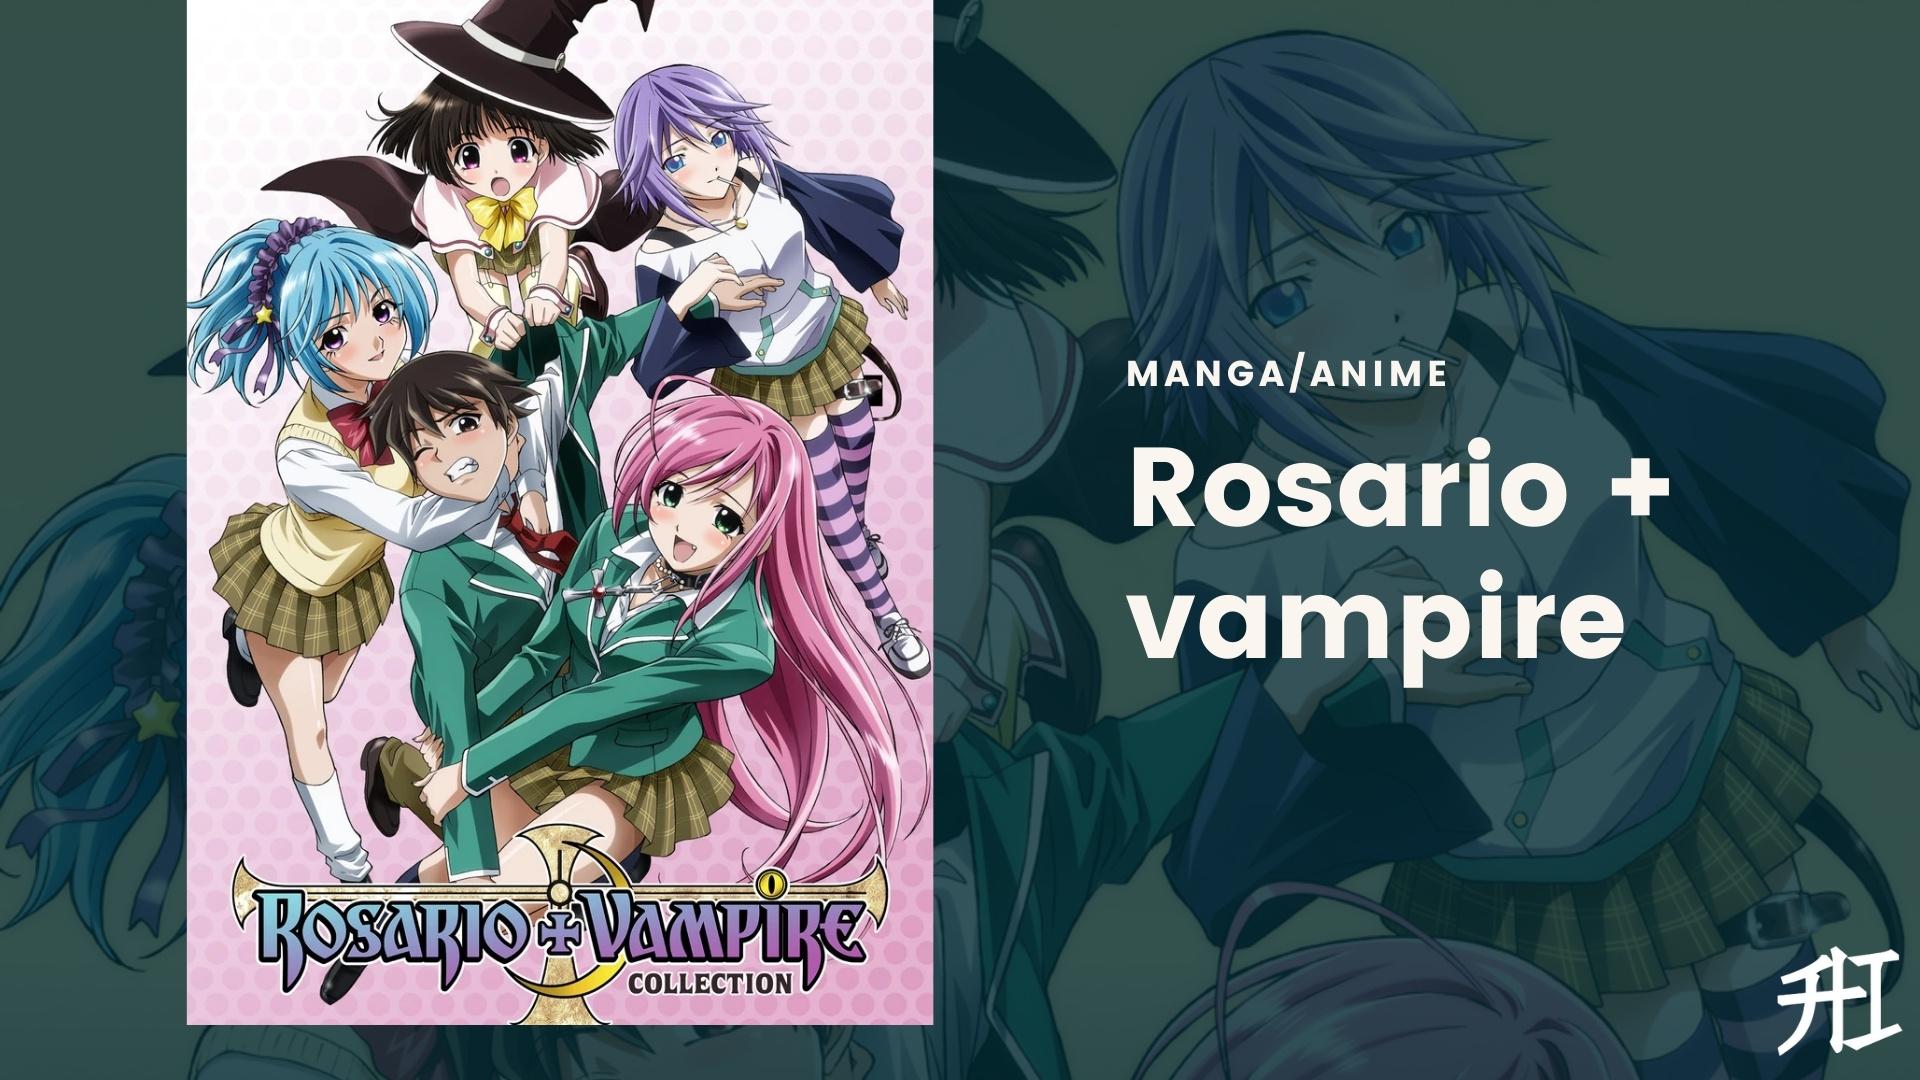 Rosario + vampire - Haren anime